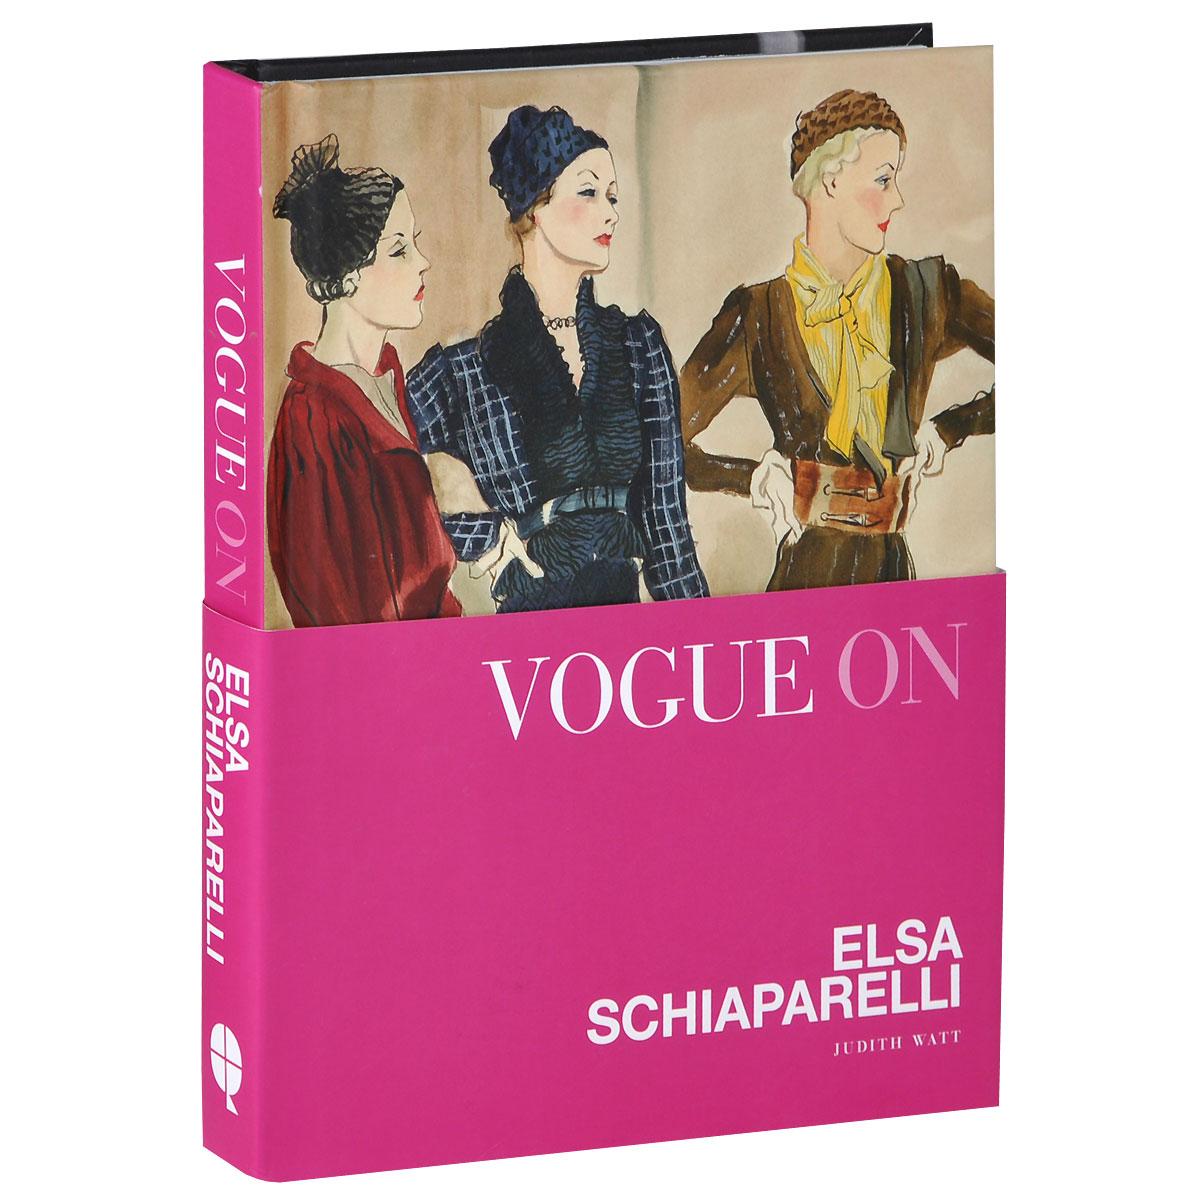 Vogue on: Elsa Schiaparelli